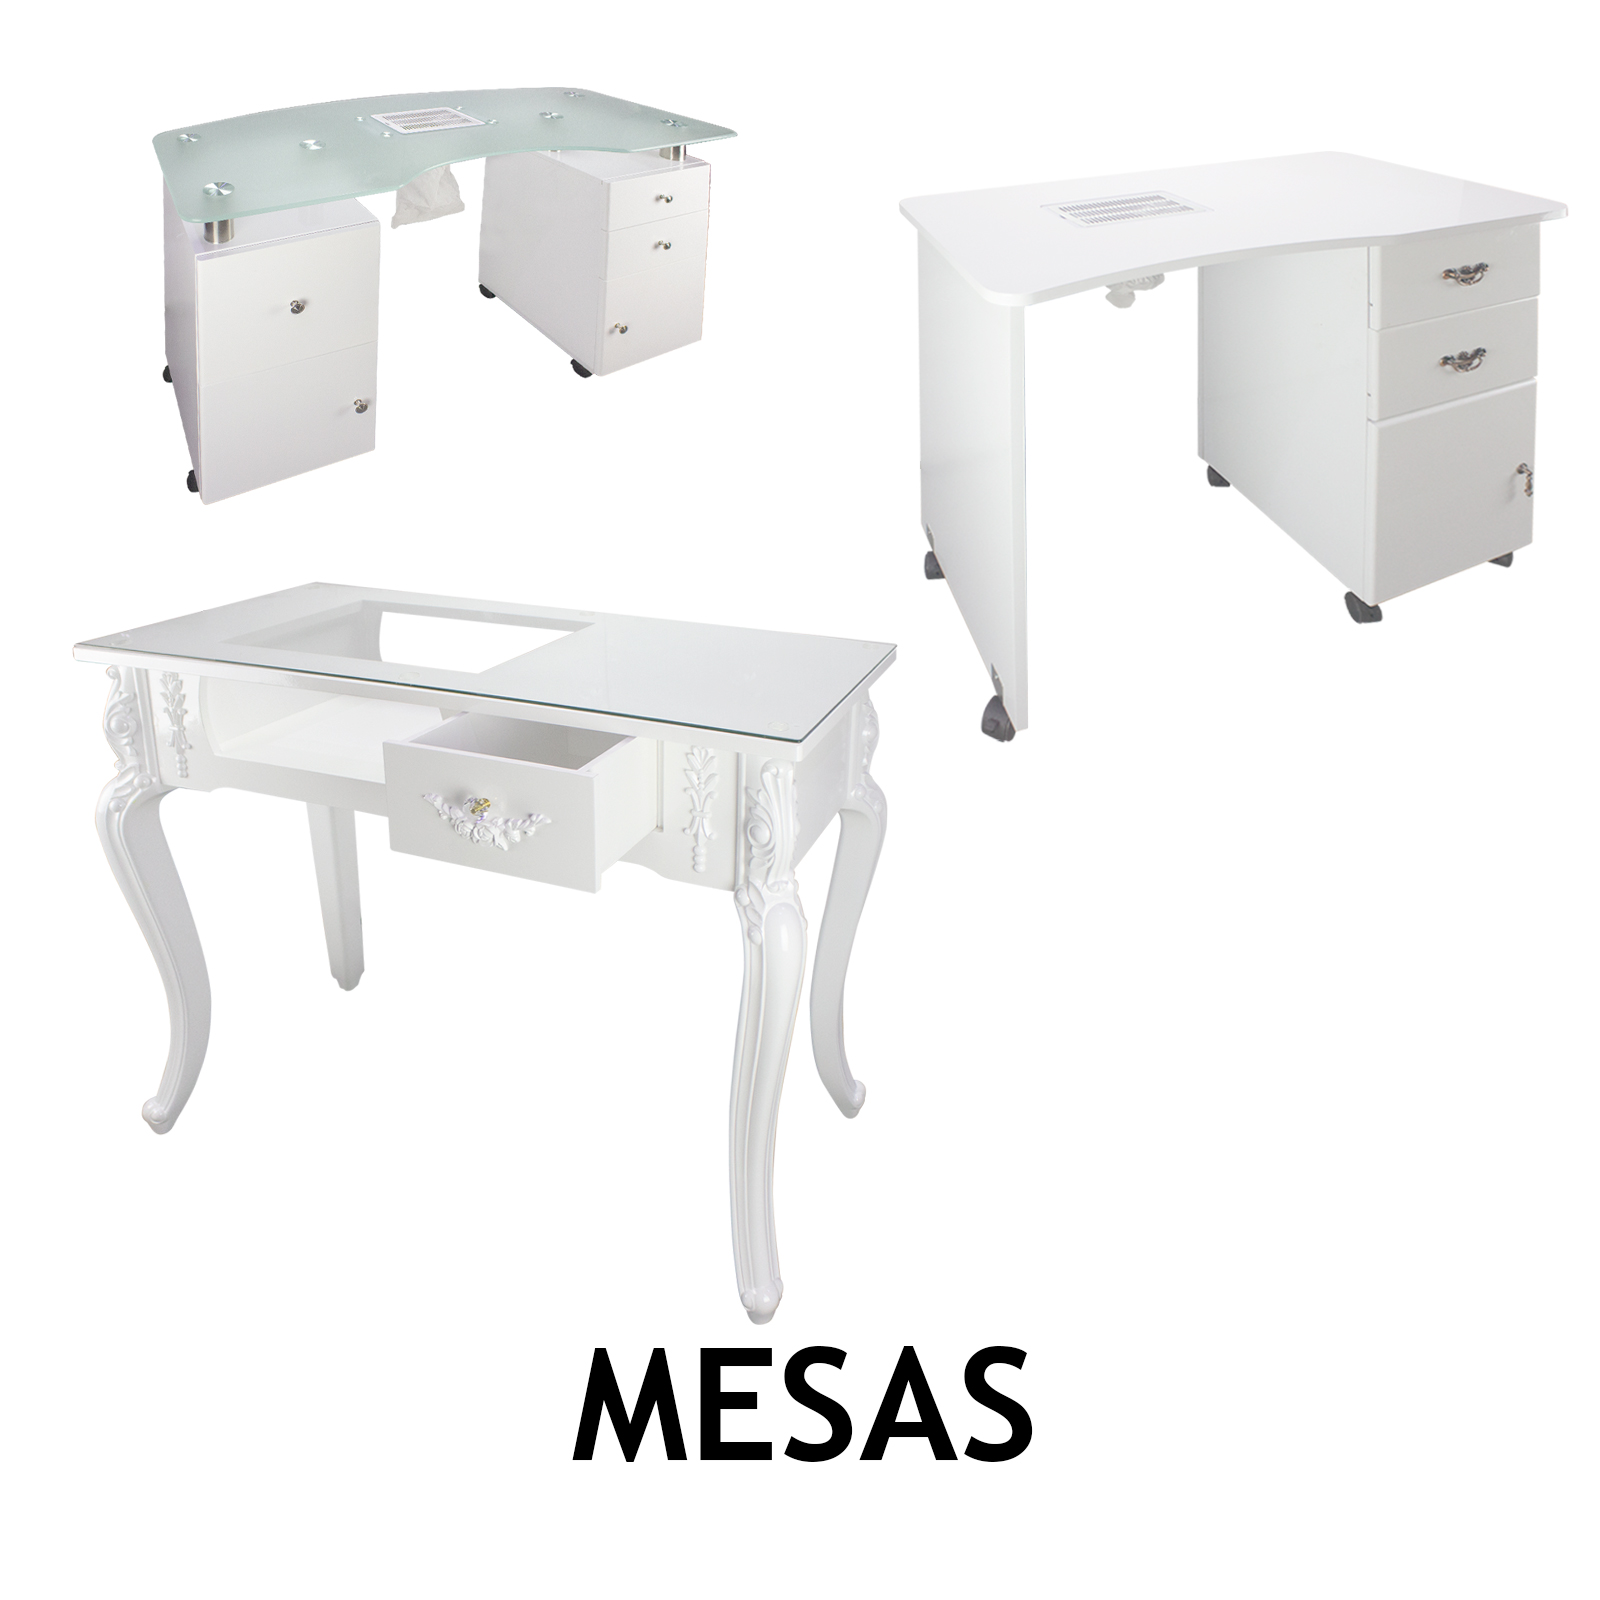 Mesas | JNC Fashion